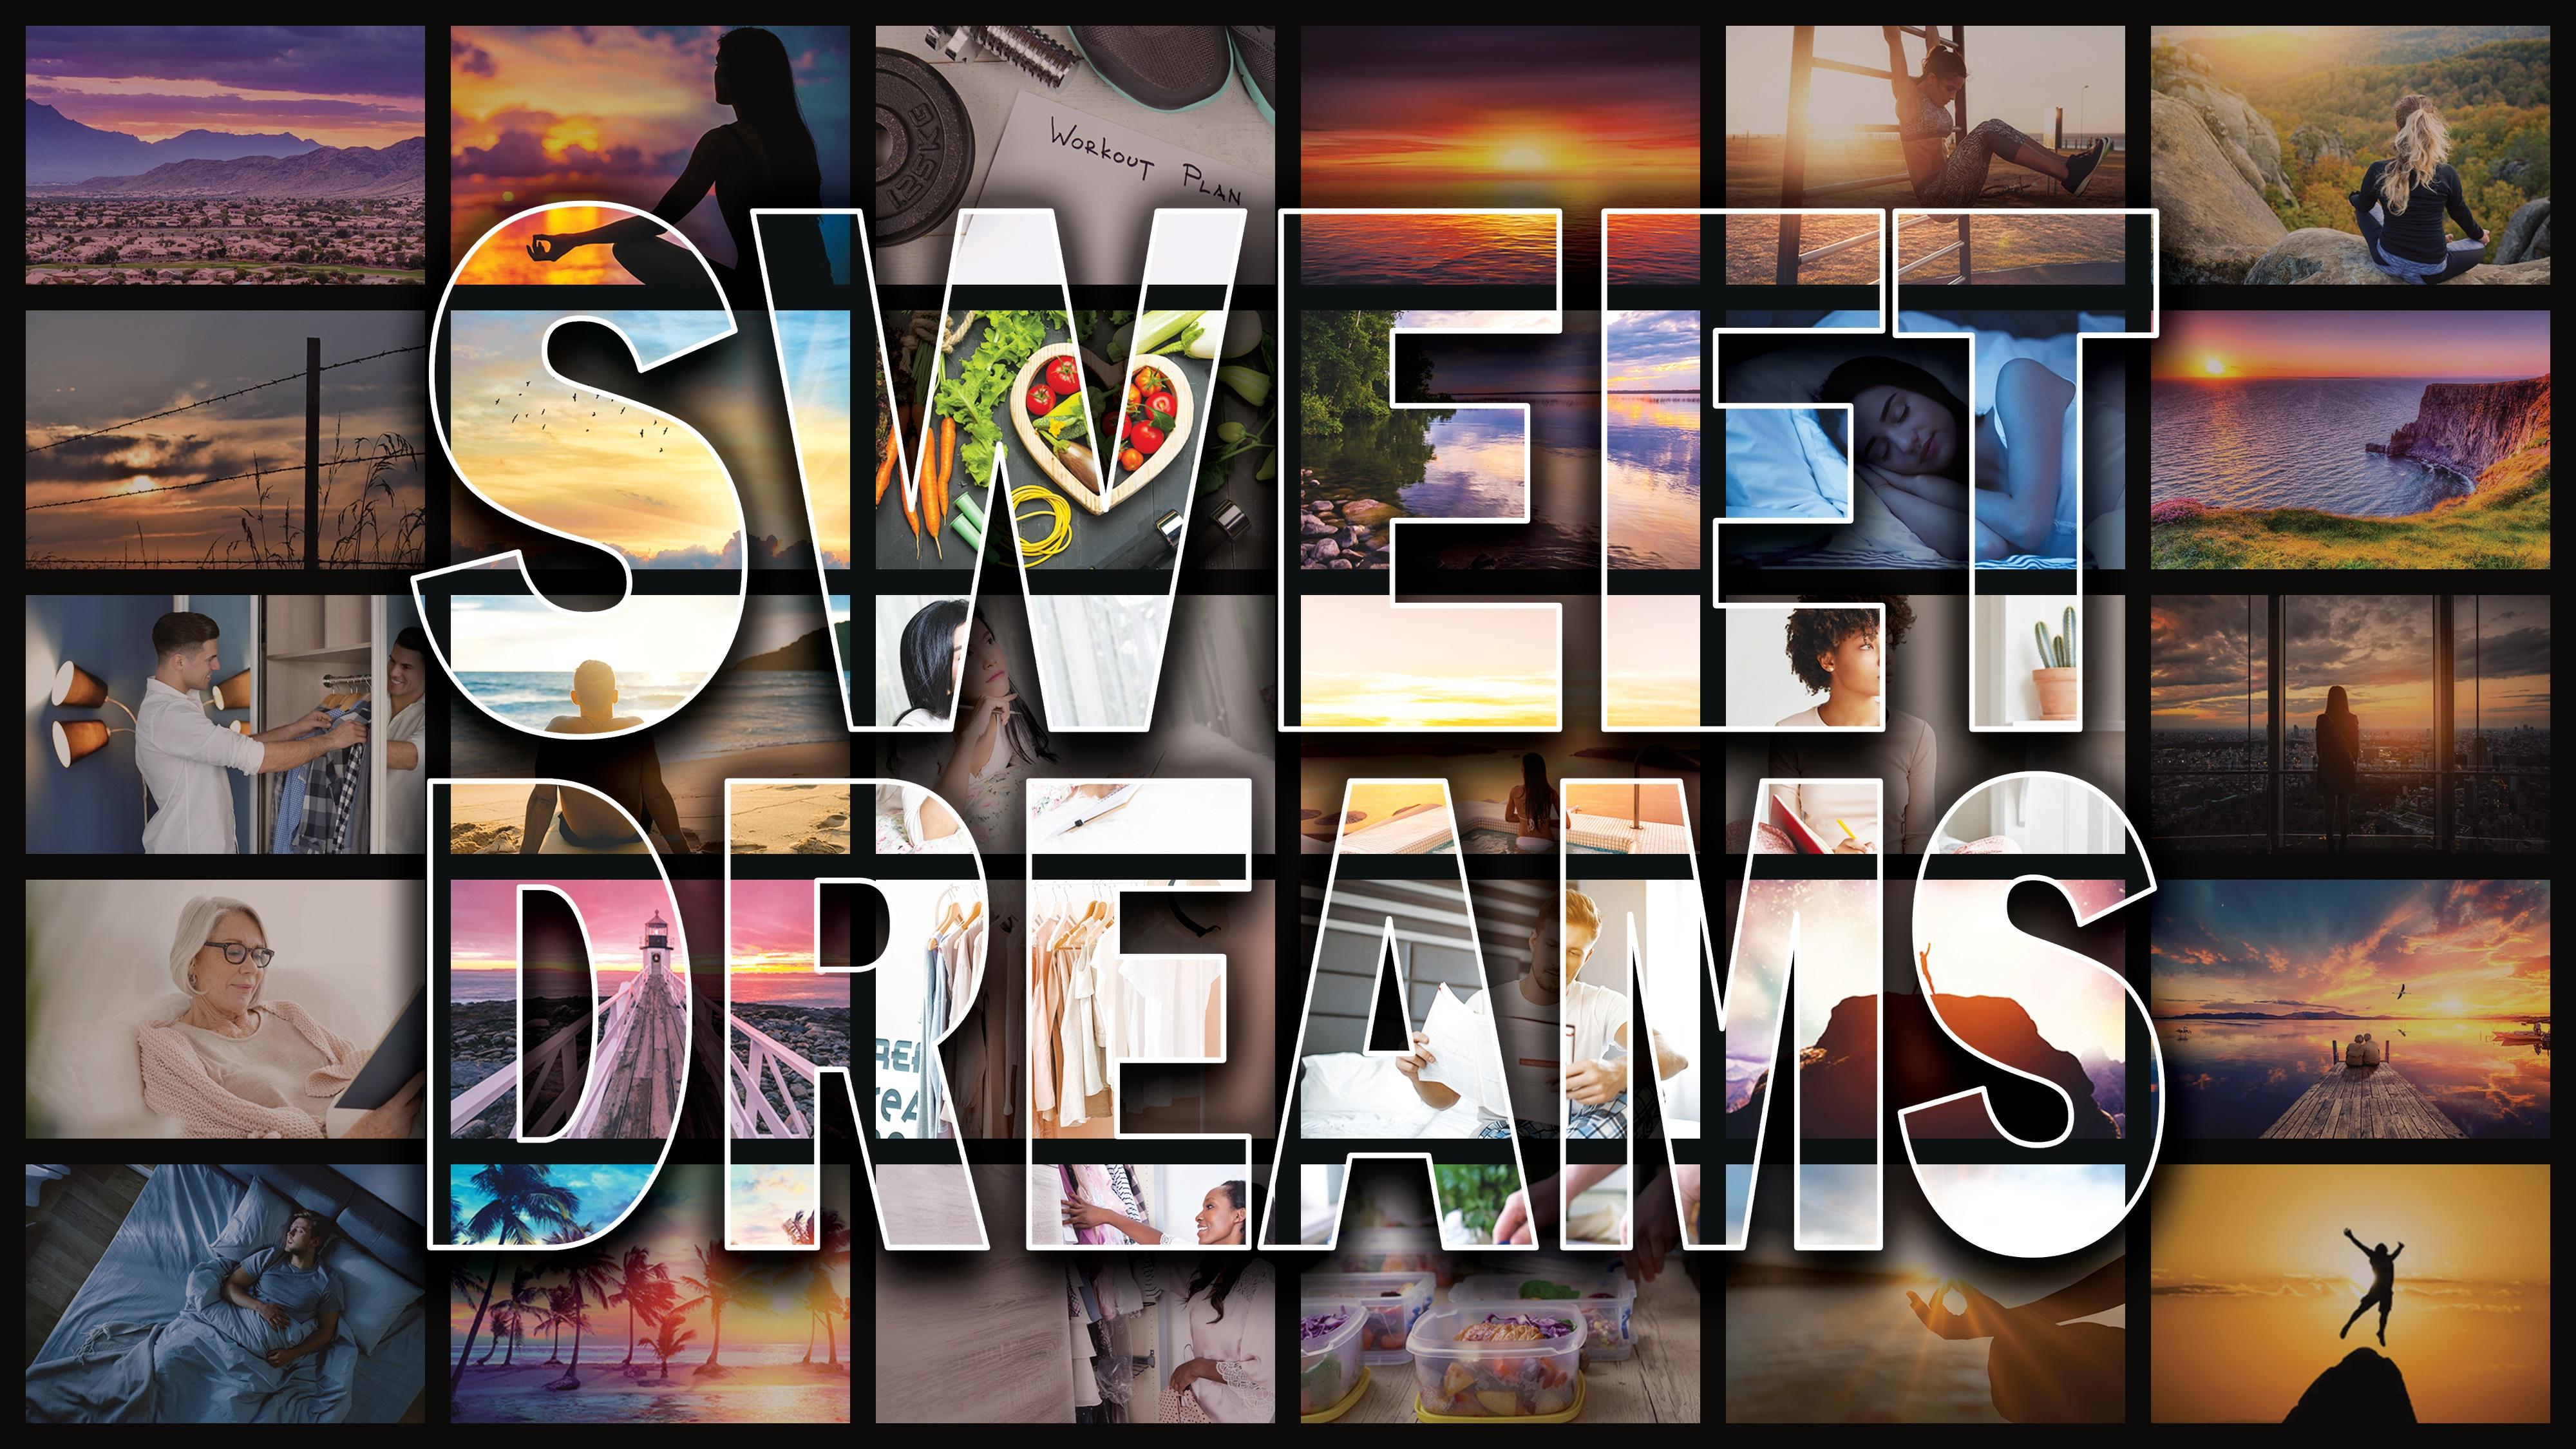 Sweet Dreams June 2020